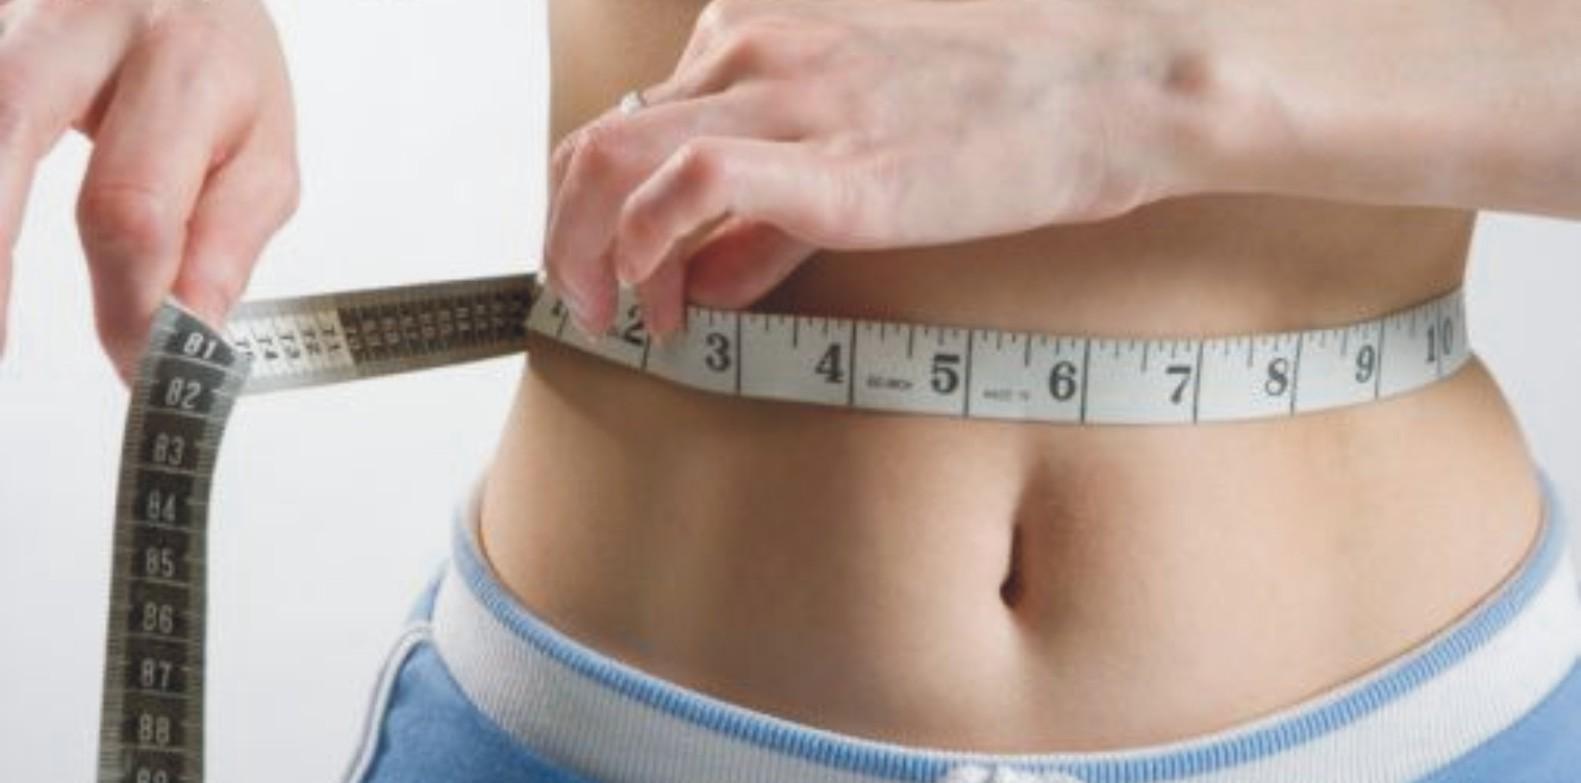 Membantu Menjaga Berat Badan